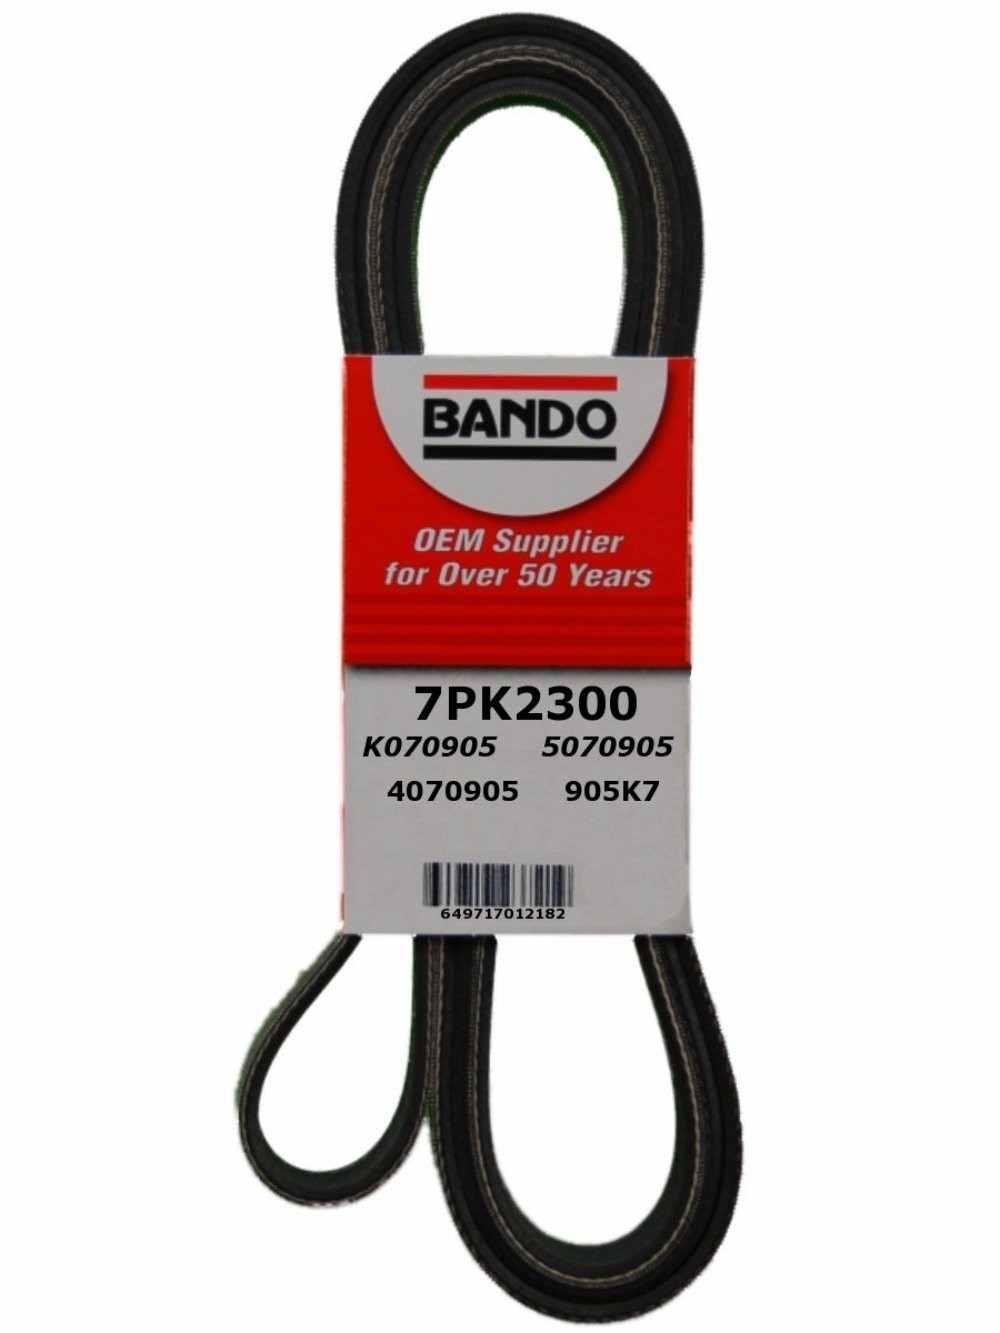 BANDO - Rib Ace Precision Engineered V-Ribbed Belt (Fan, Alternator and Power Steering) - BWO 7PK2300